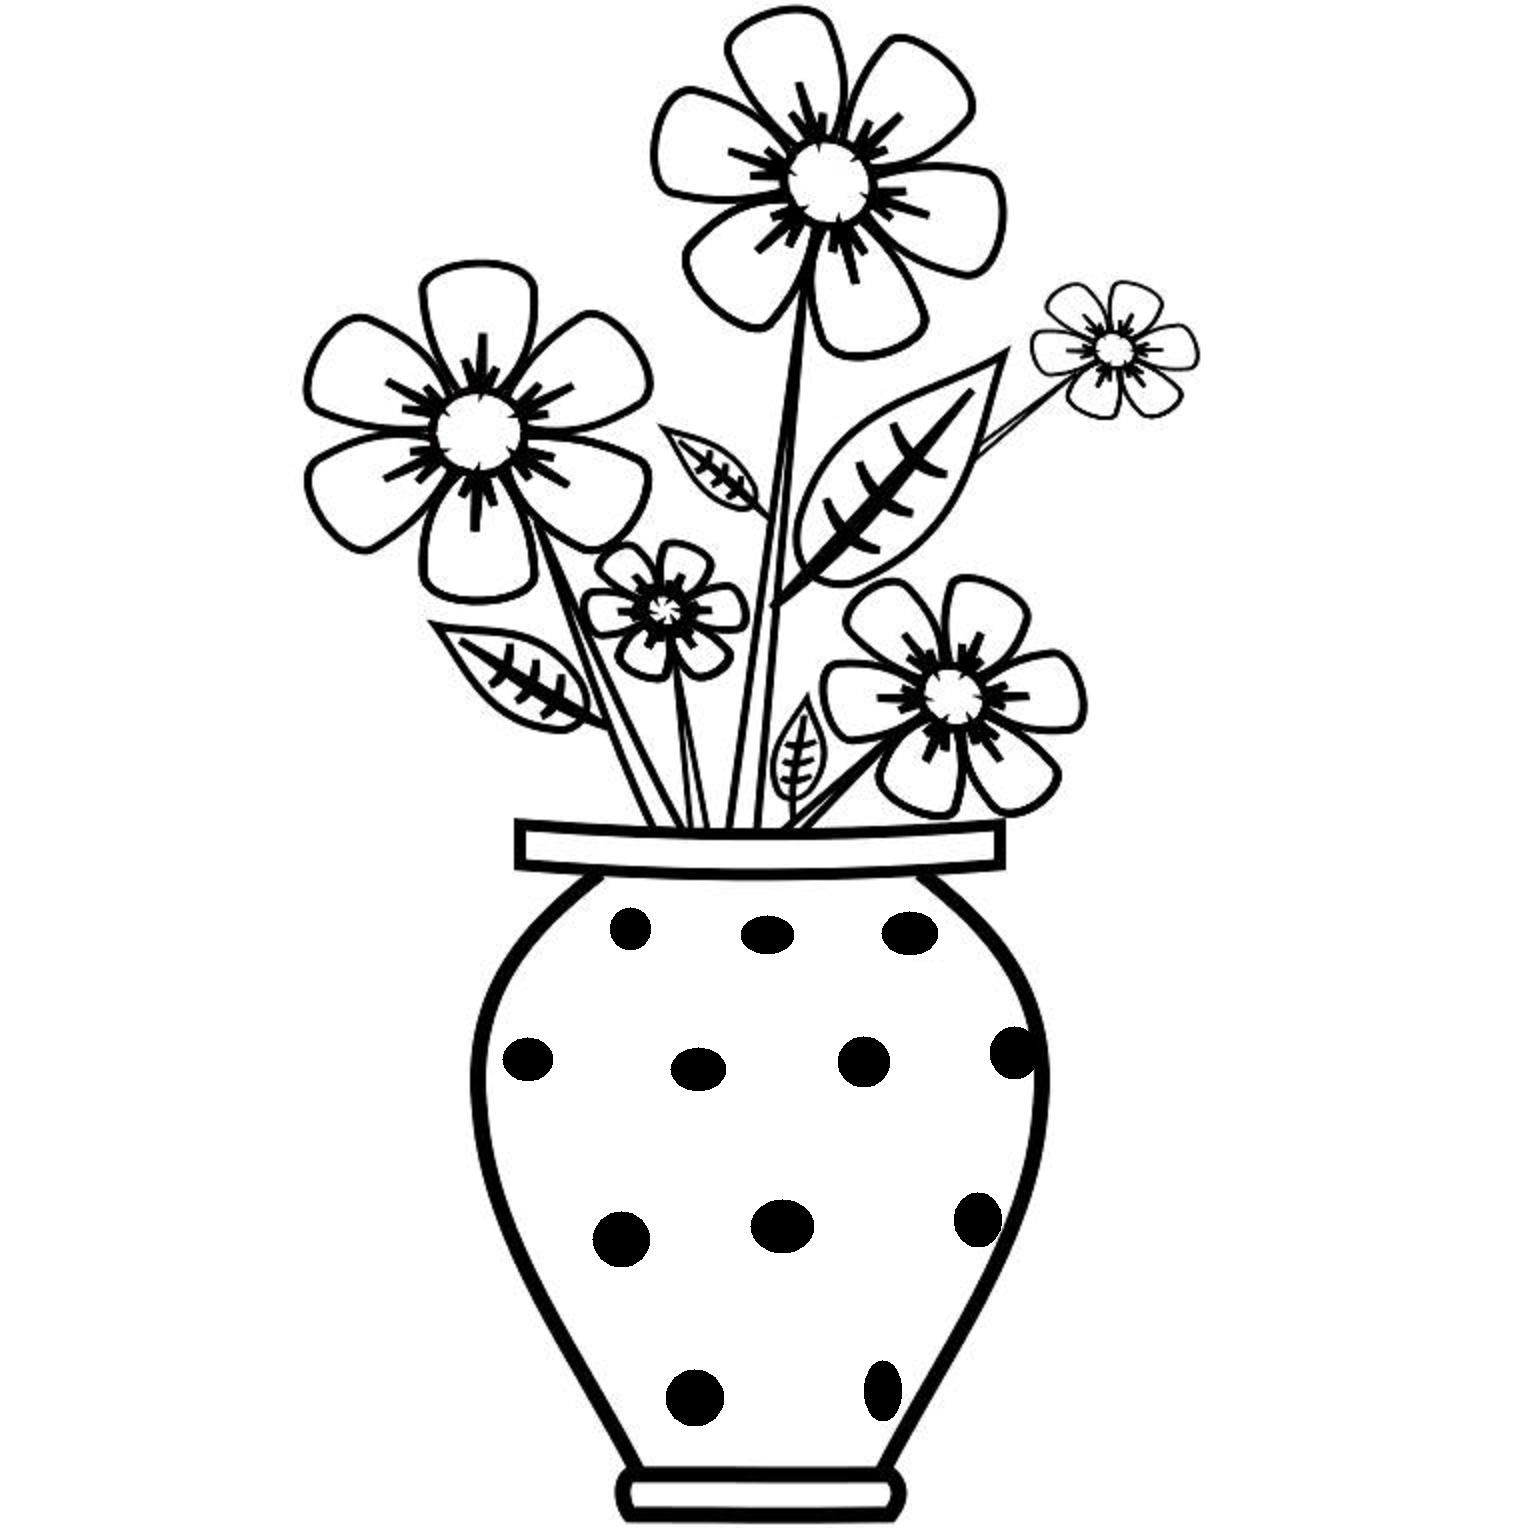 Drawn vase flower vase Vase How A Flower A